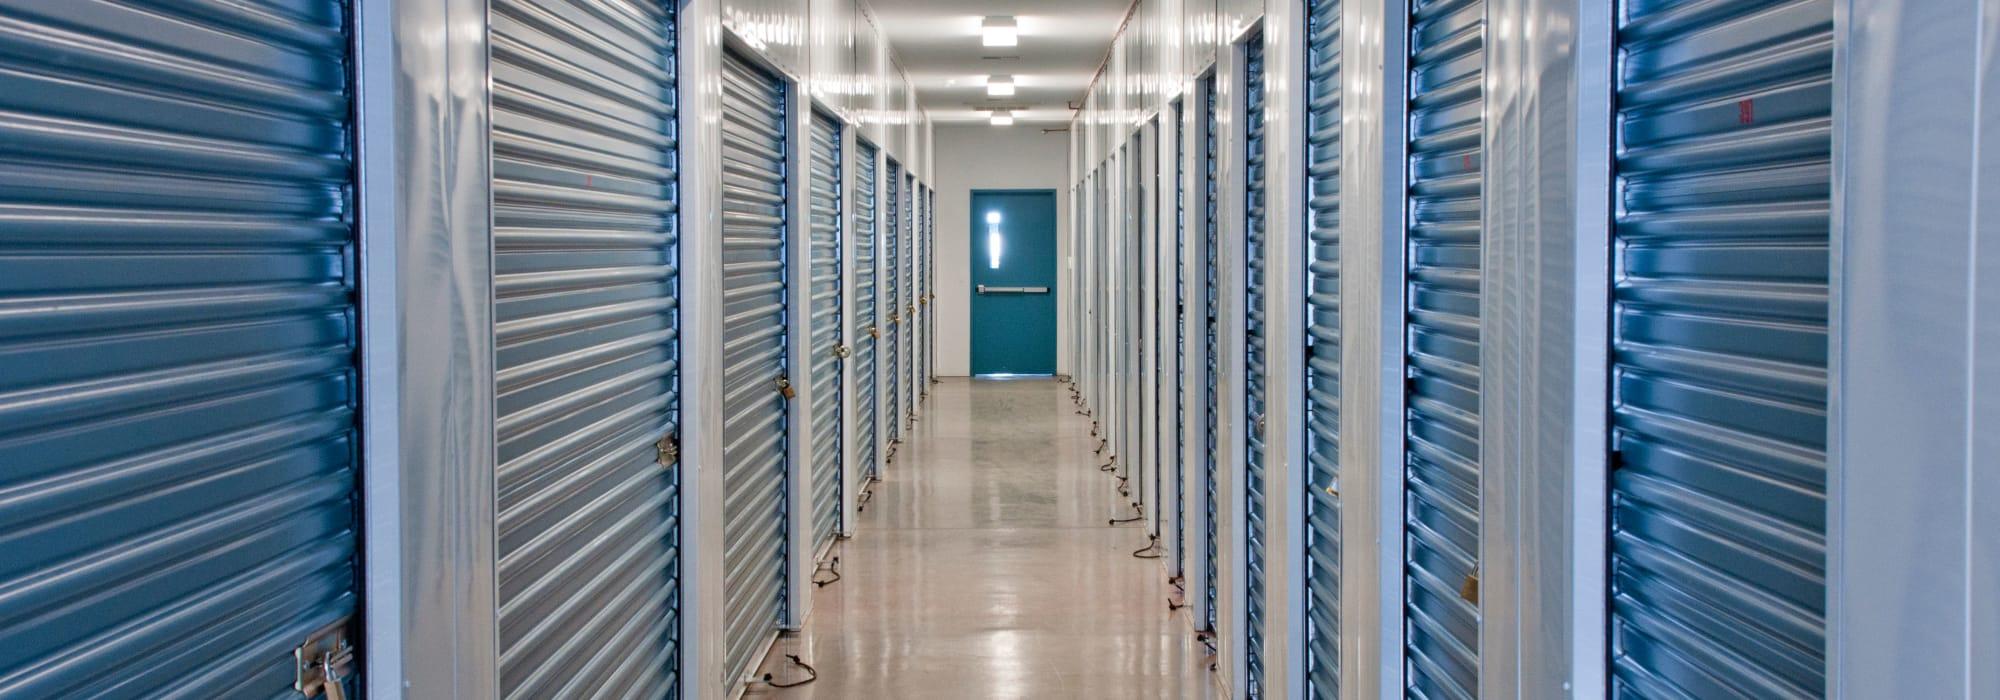 Self storage in Compass Self Storage in West Palm Beach, Florida